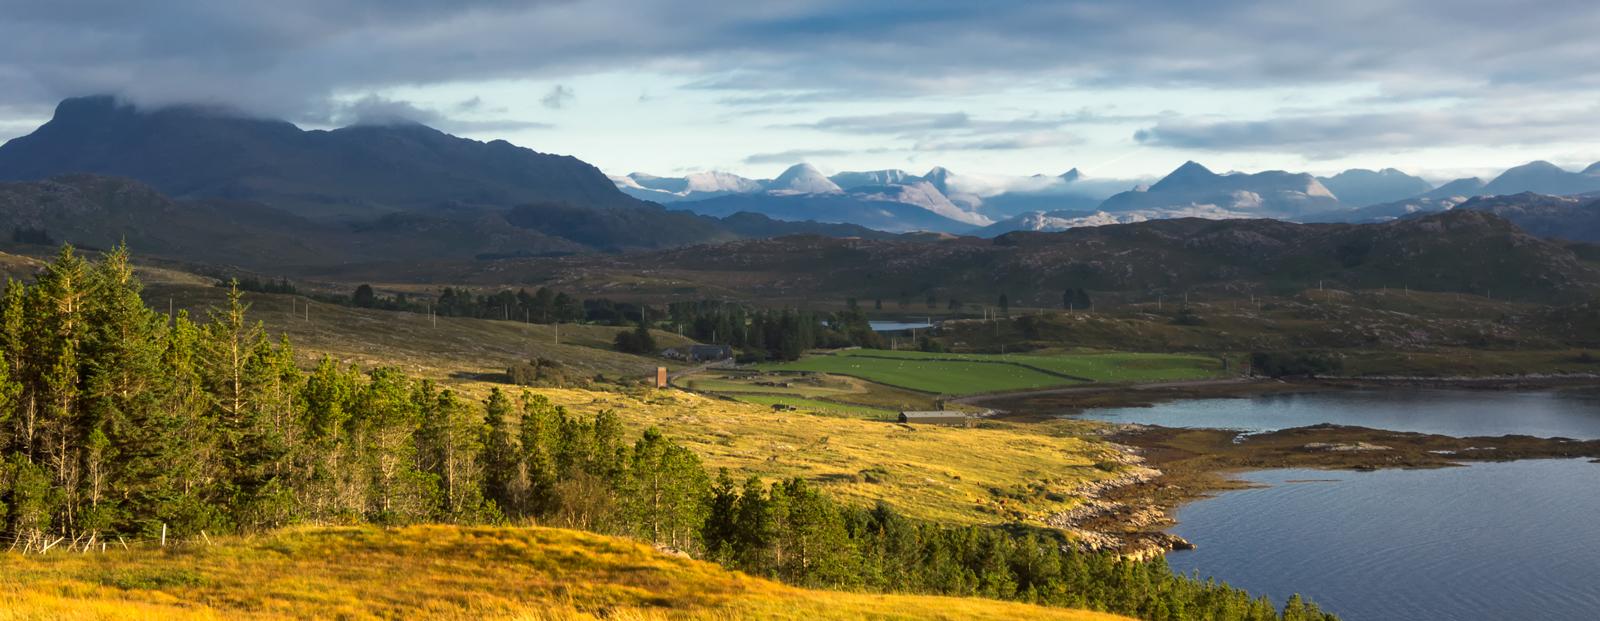 1189-Schotland24_WMP